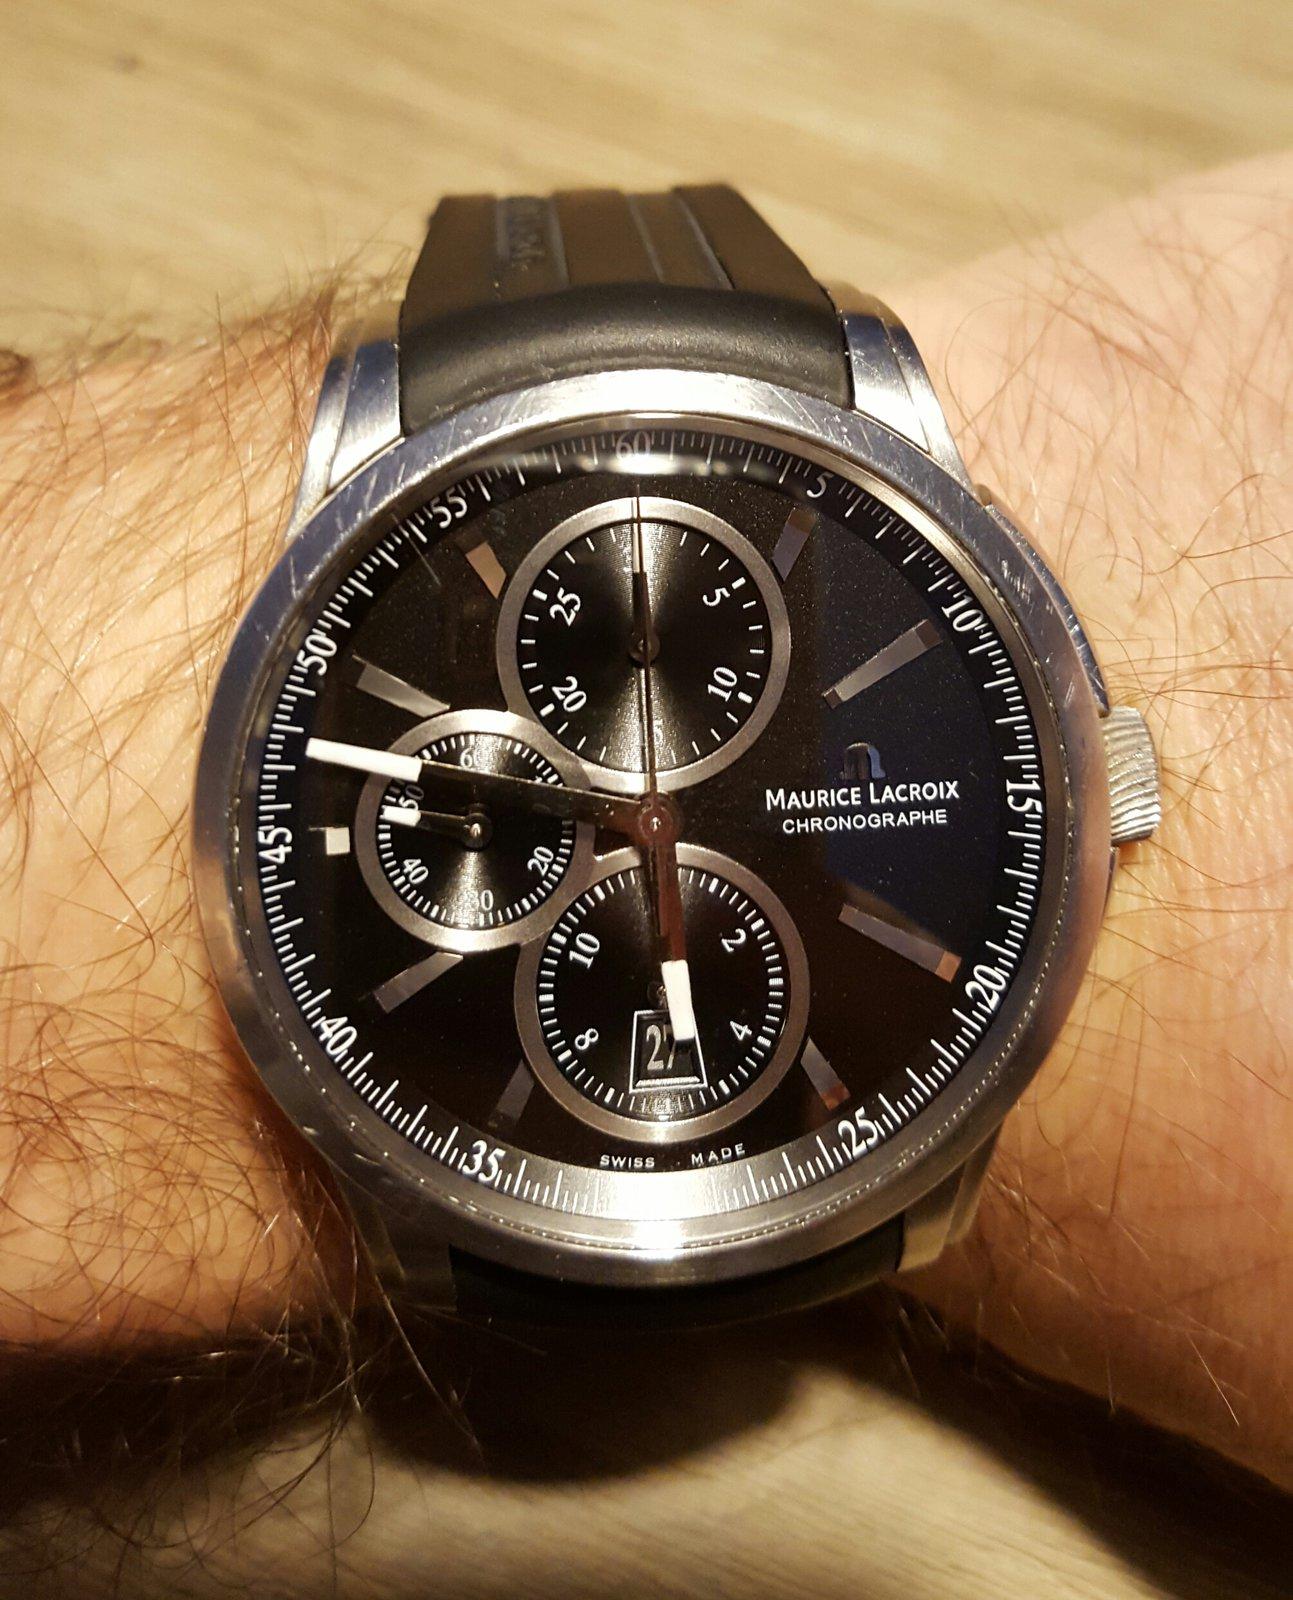 Pontos 330 1 Maurice Ss001 Chronograph Lacroix Pt6188 Nmwn80